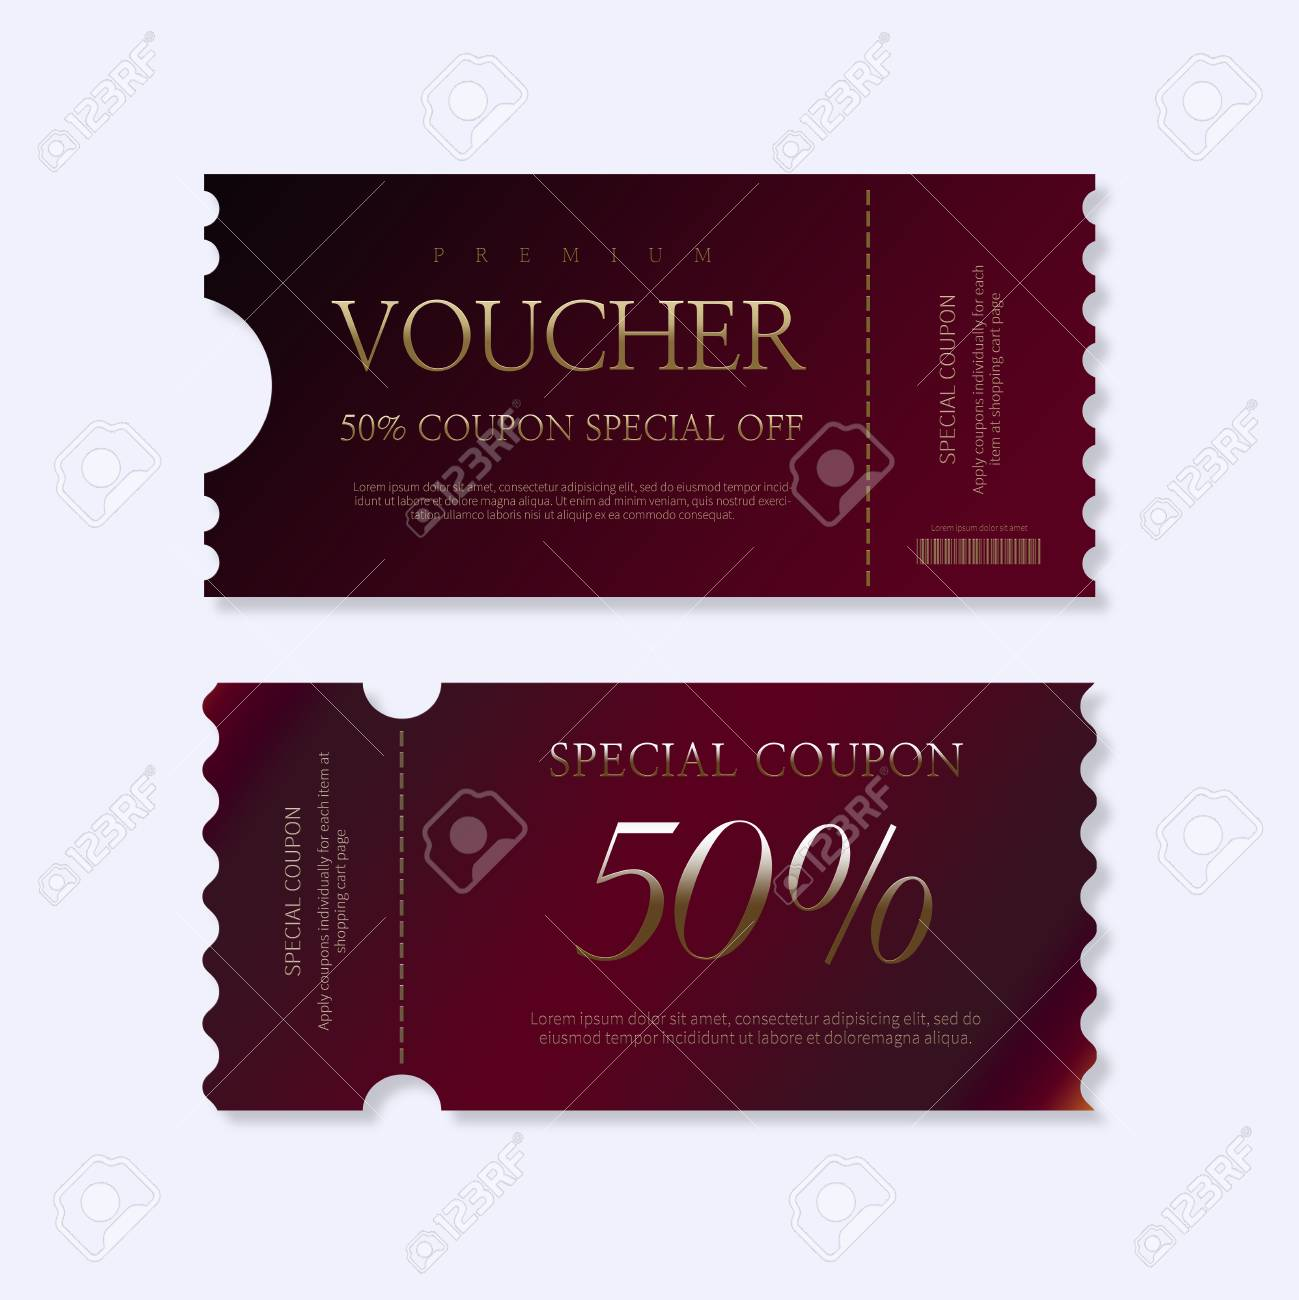 Discount Voucher Design Template Gift Voucher Certificate Coupon